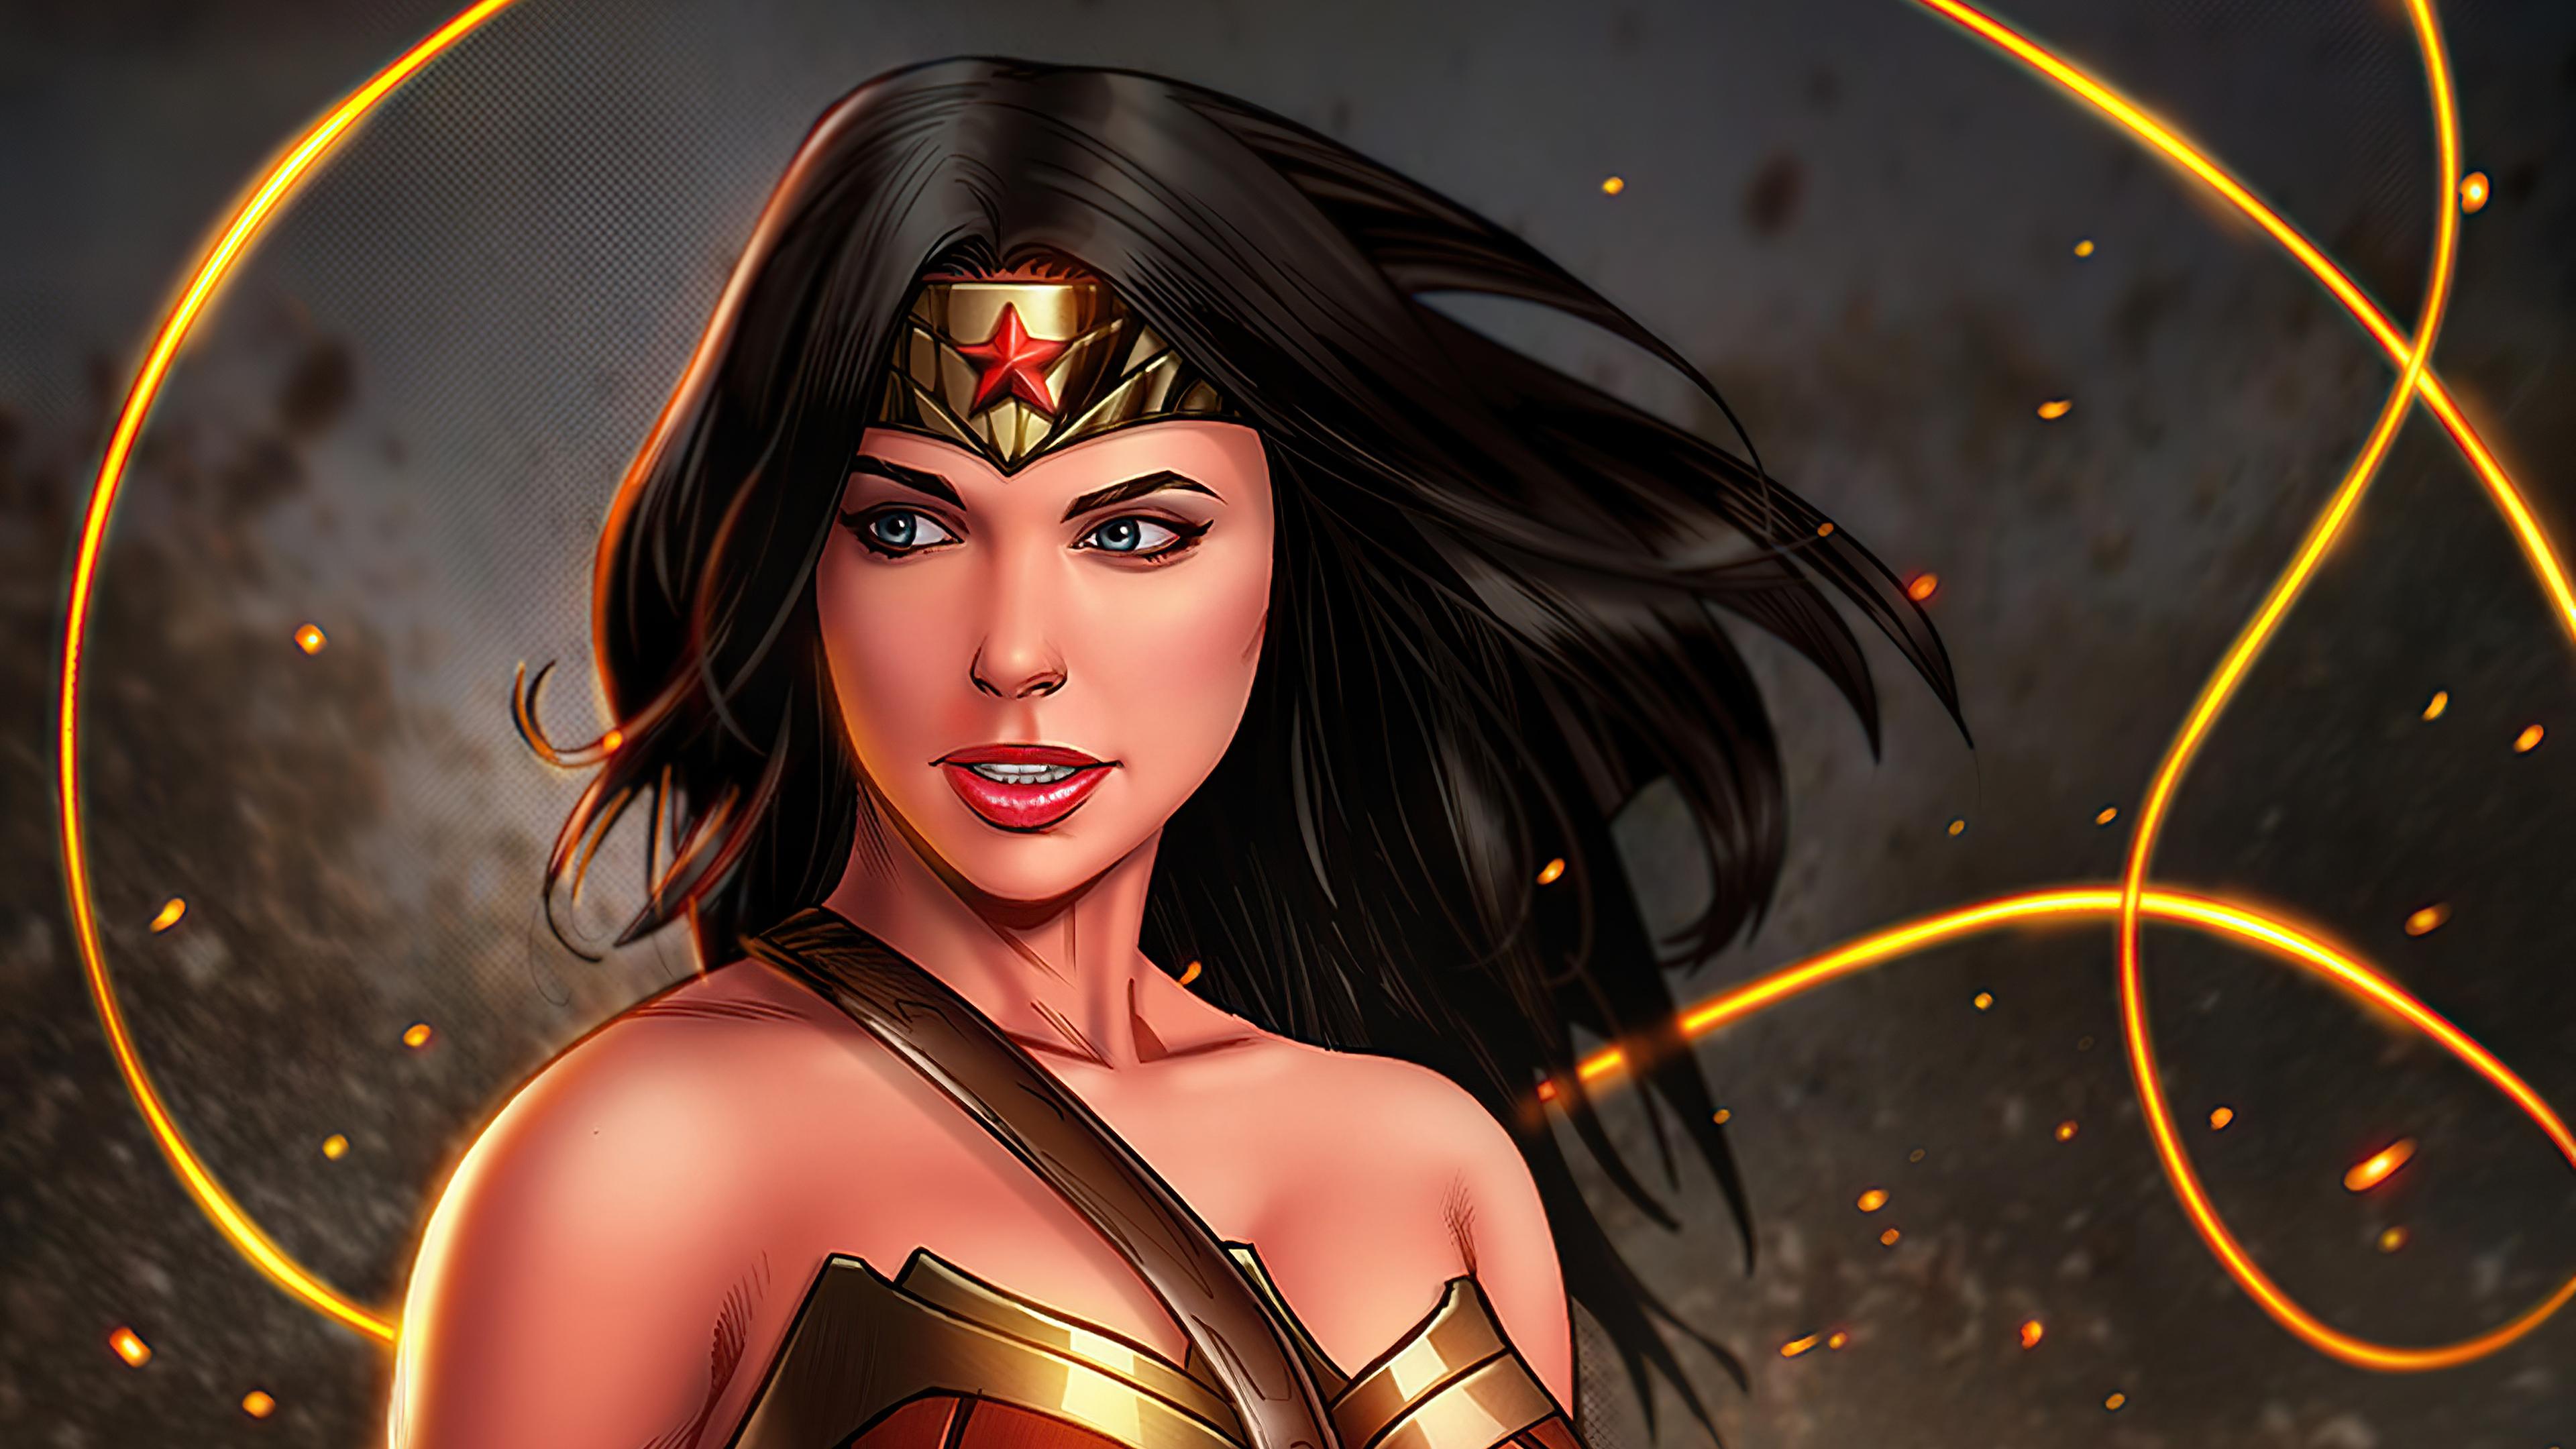 wonder woman superheroine 4k 1616955055 - Wonder Woman Superheroine 4k - Wonder Woman Superheroine 4k wallpapers